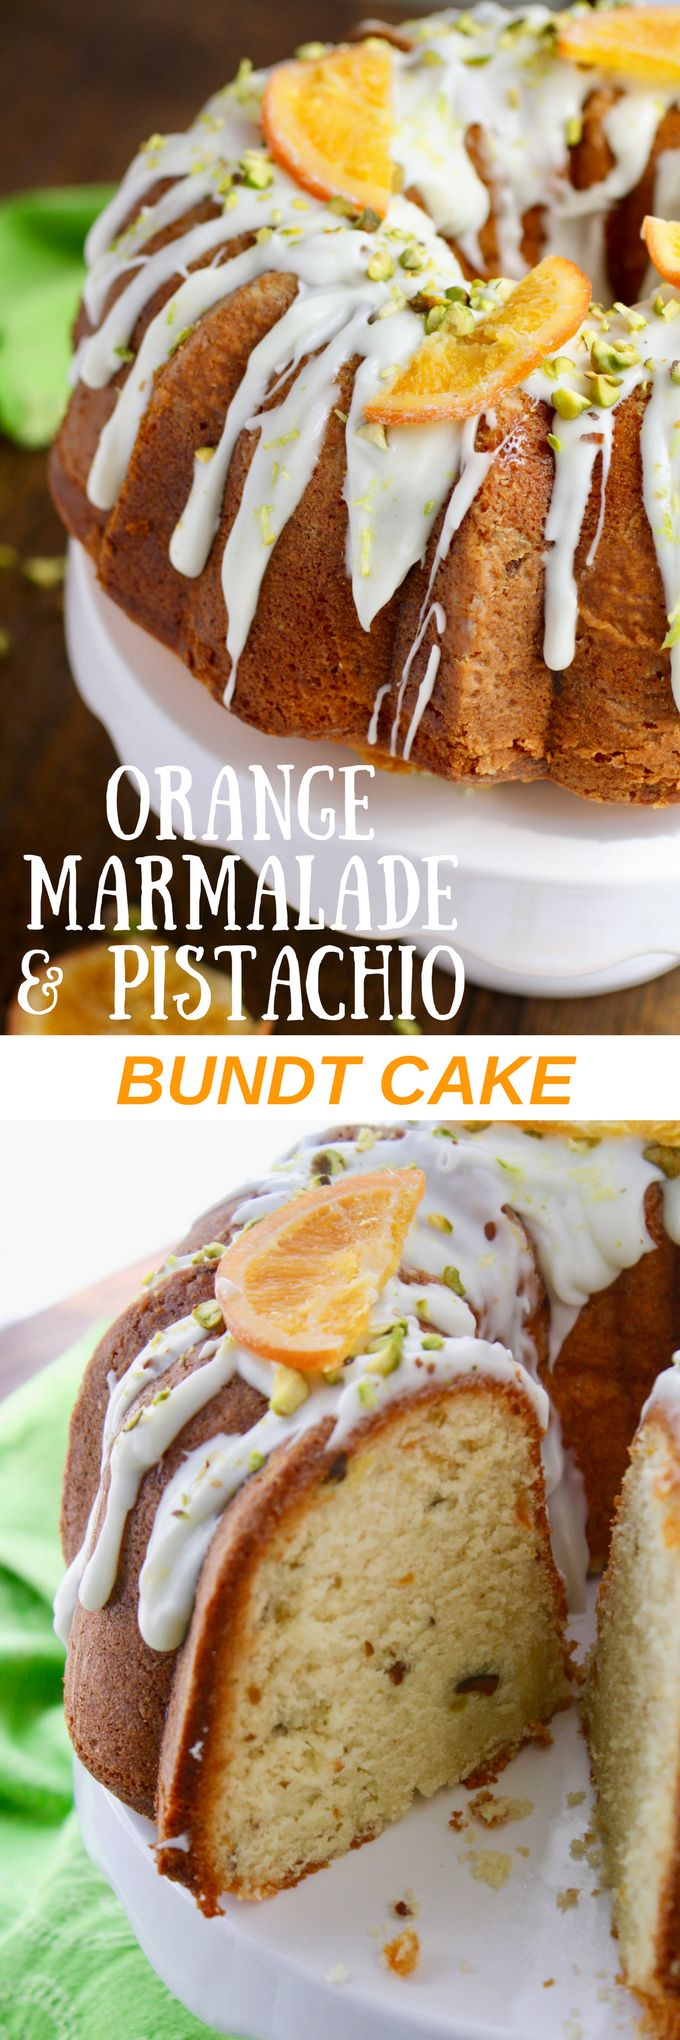 Orange Marmalade-Pistachio Bundt Cake is a true treat! Make this for dessert today!